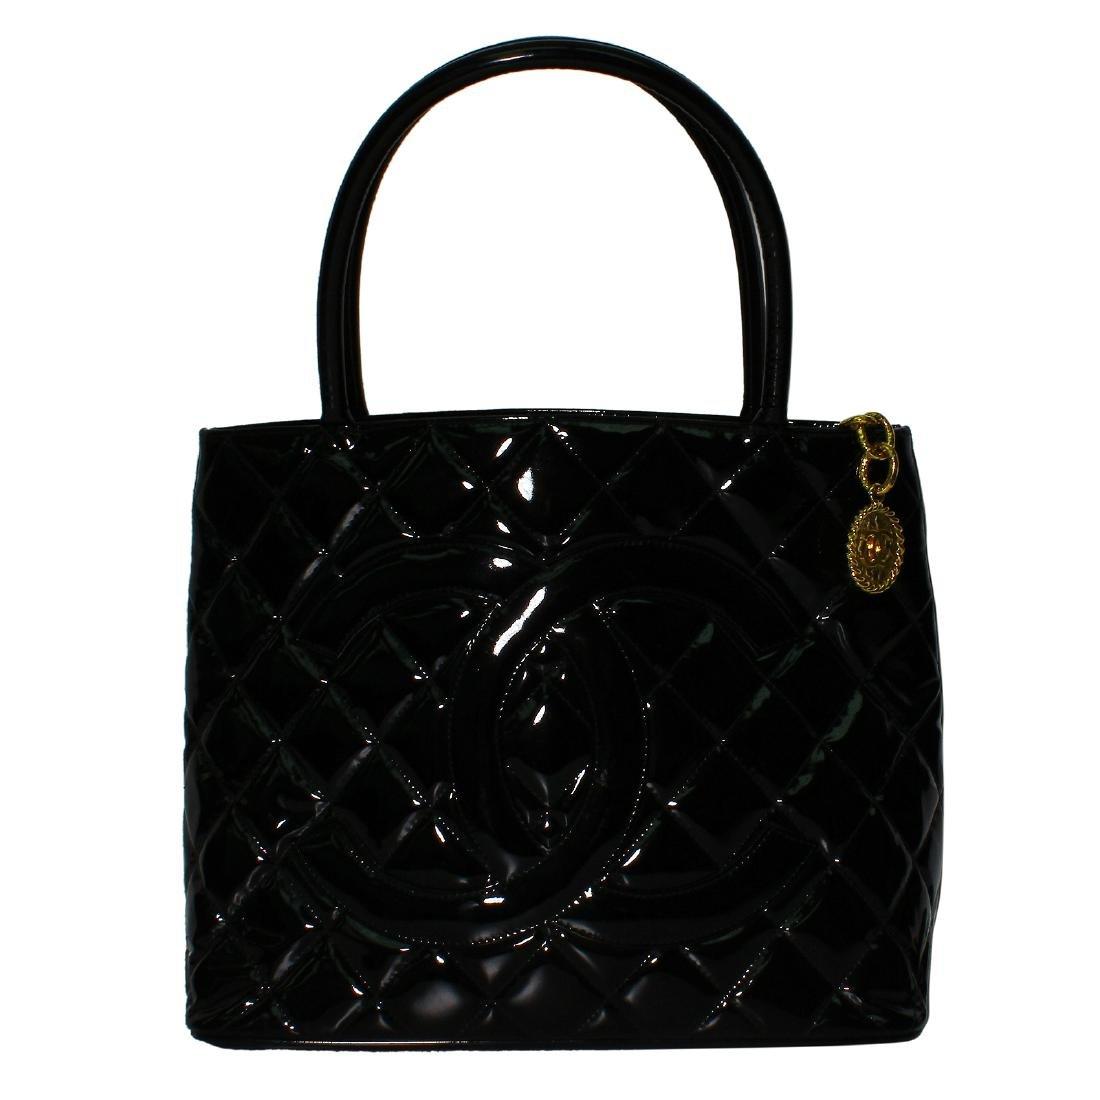 Chanel Quilted Black Patent Leather Shoulder Bag